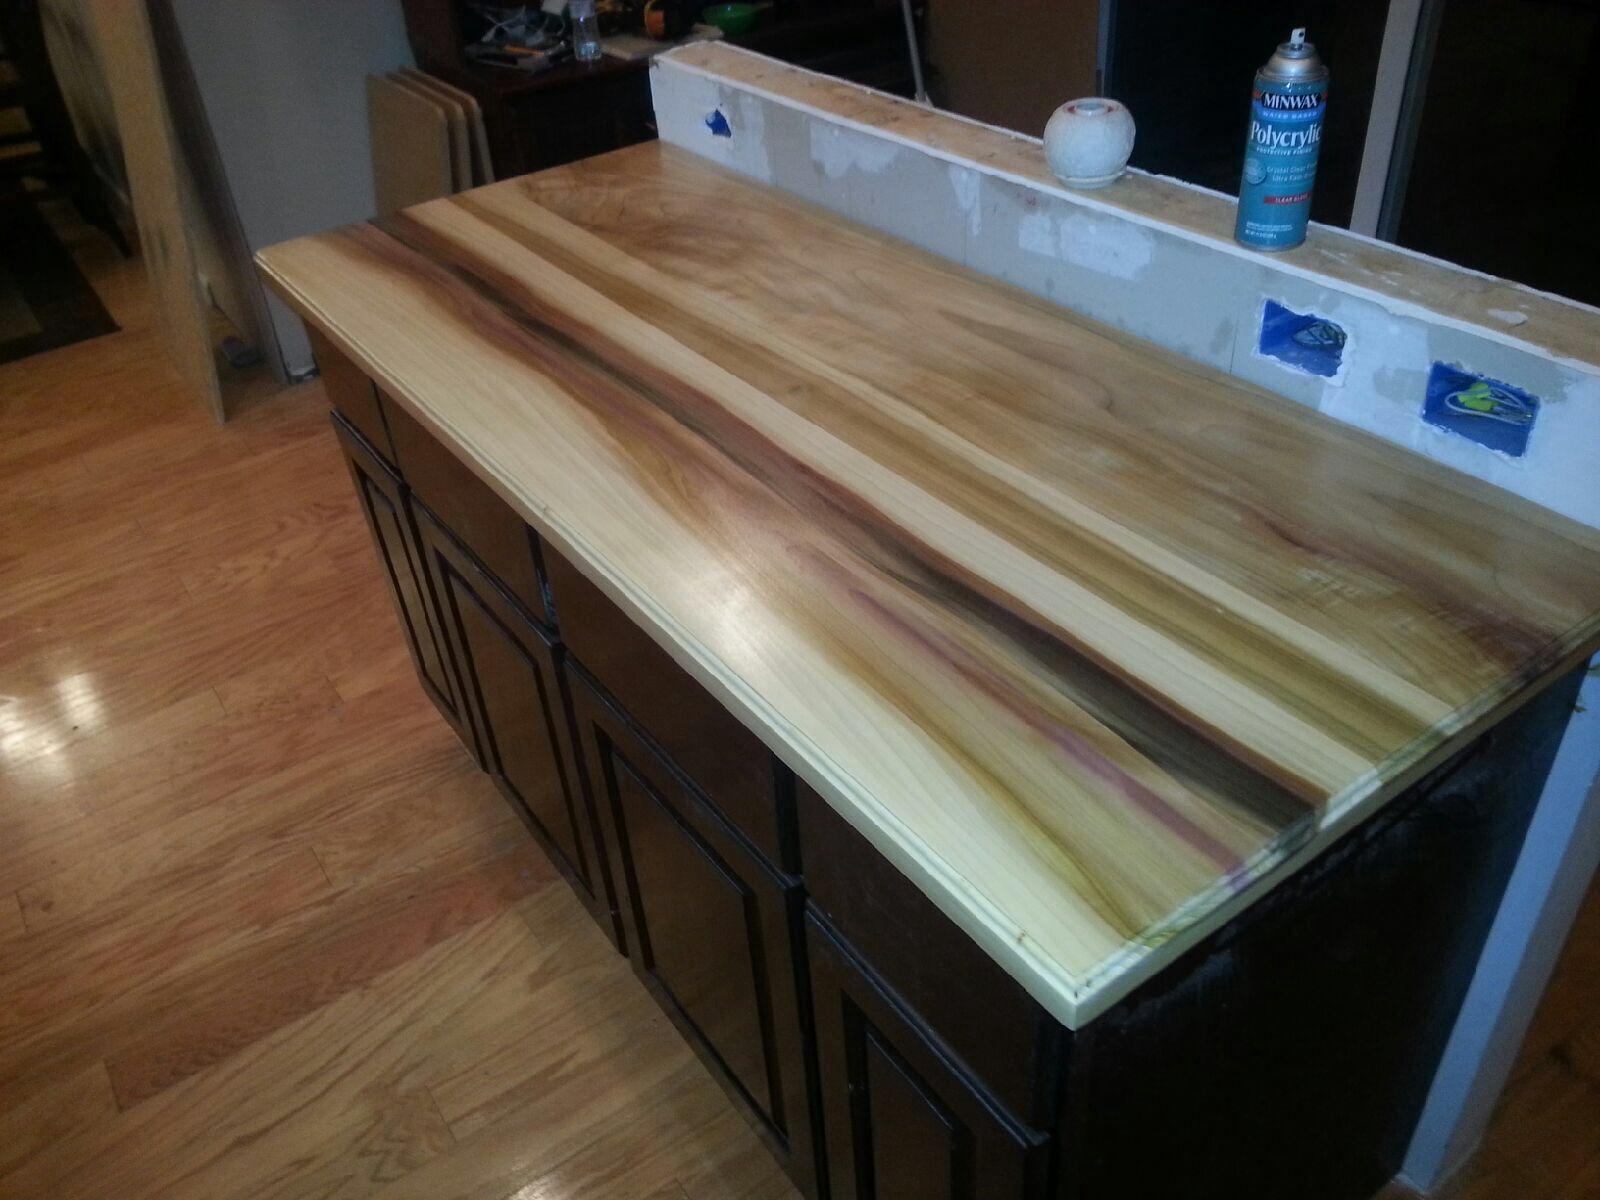 Poplar wood countertops